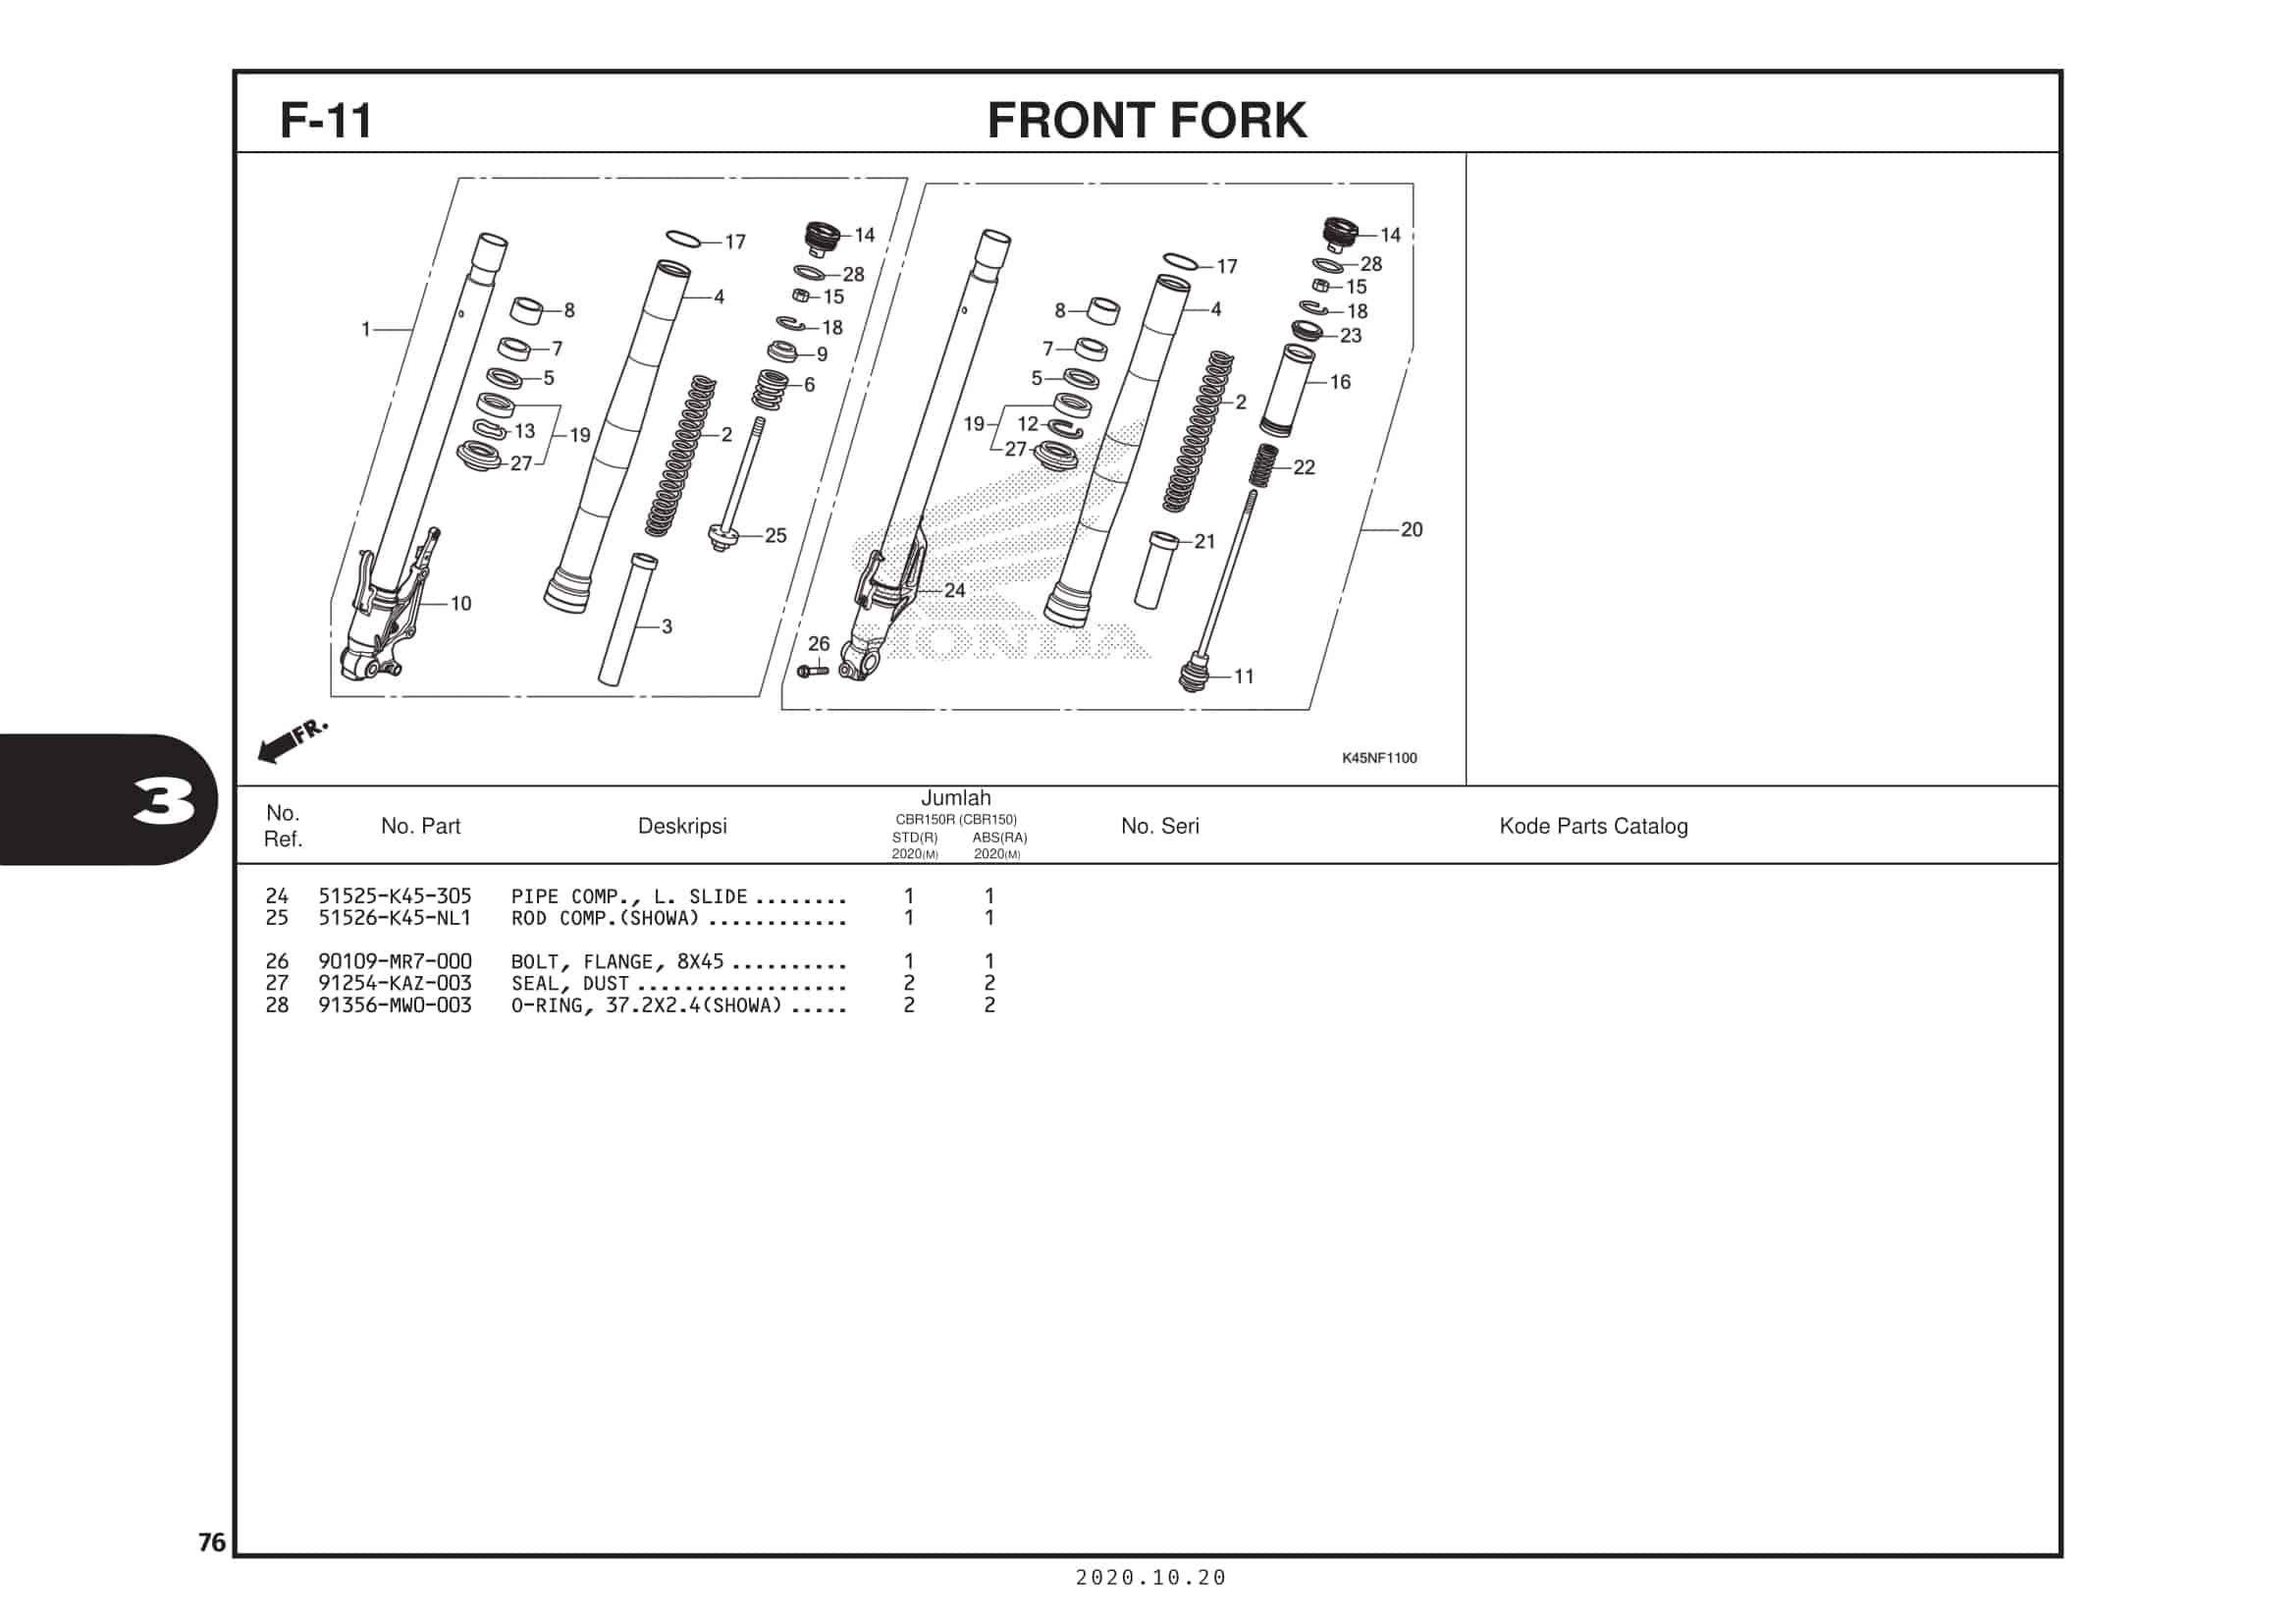 F-11 Front Fork